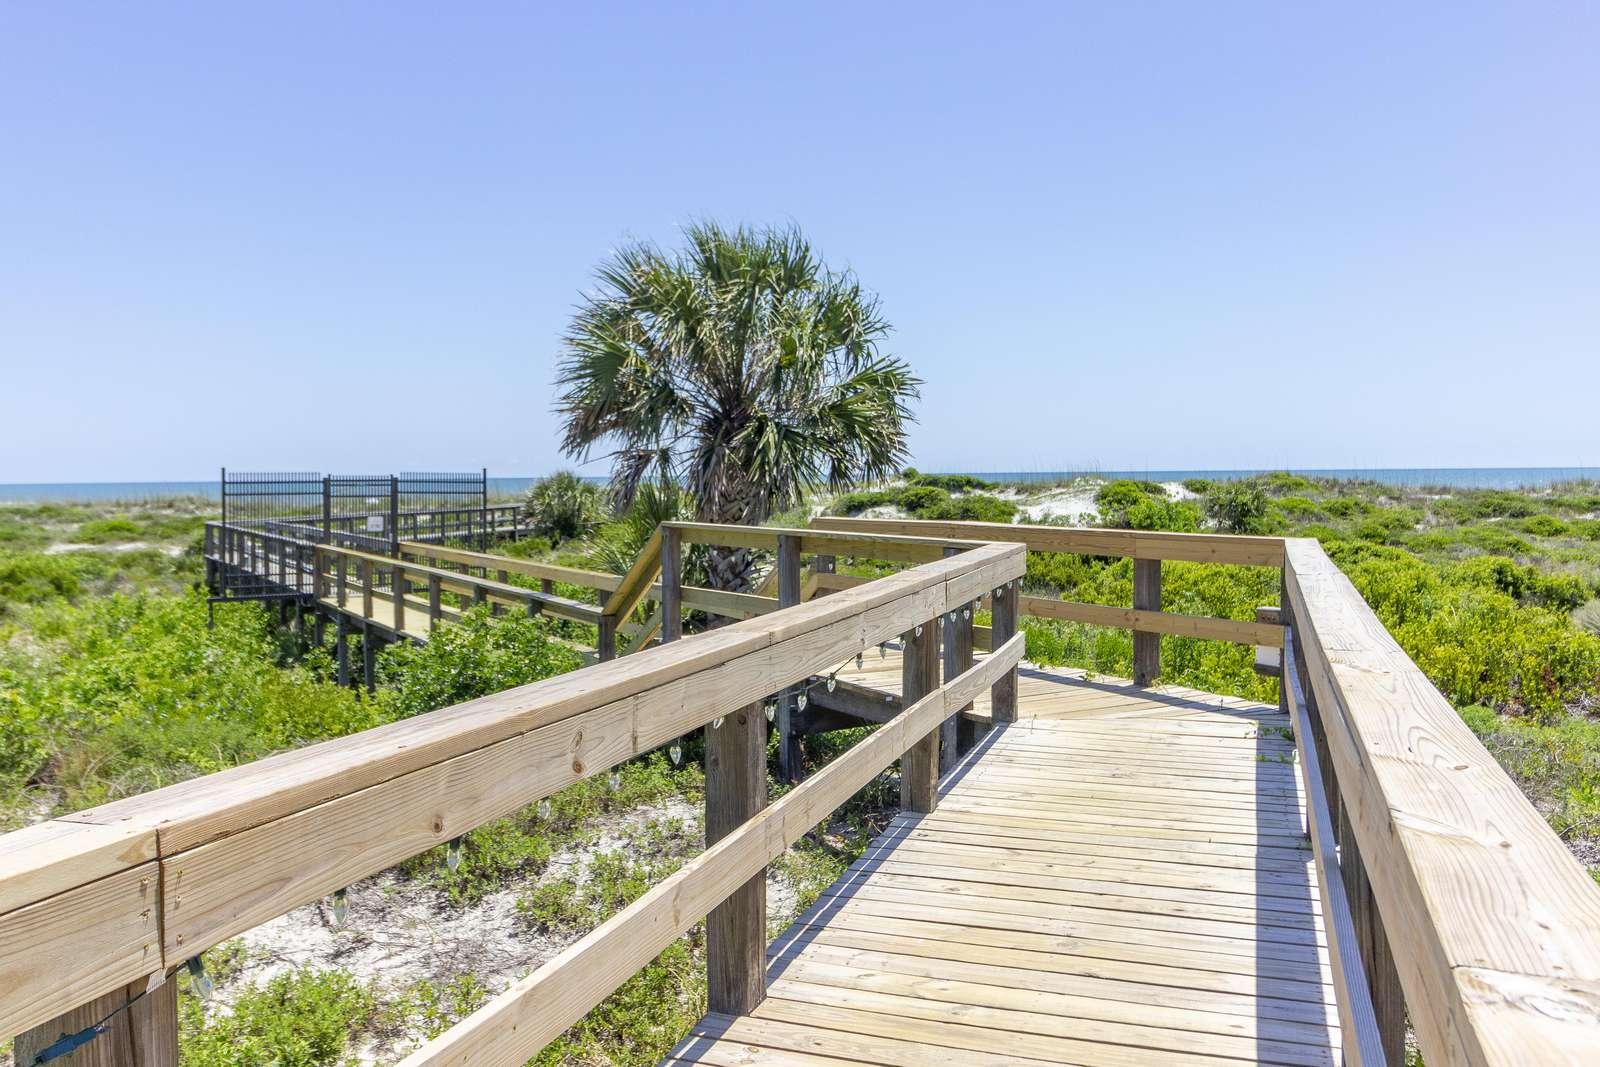 Colony Reef Beach Boardwalk